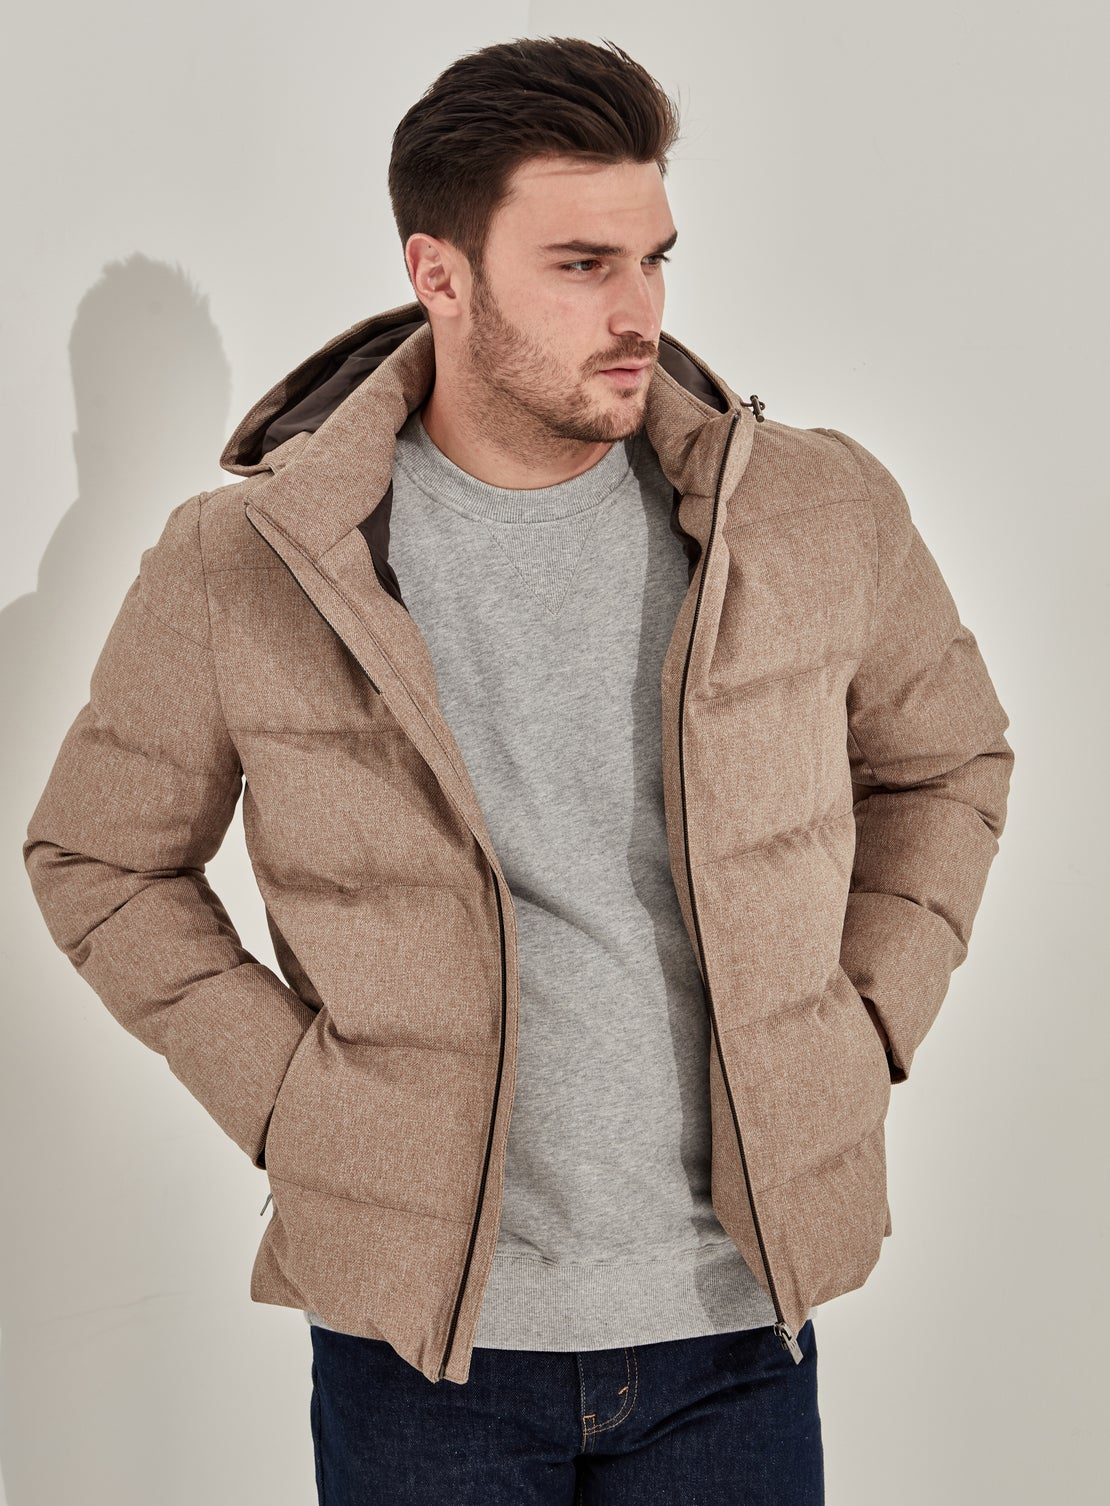 Dirk Twill Puffer Jacket